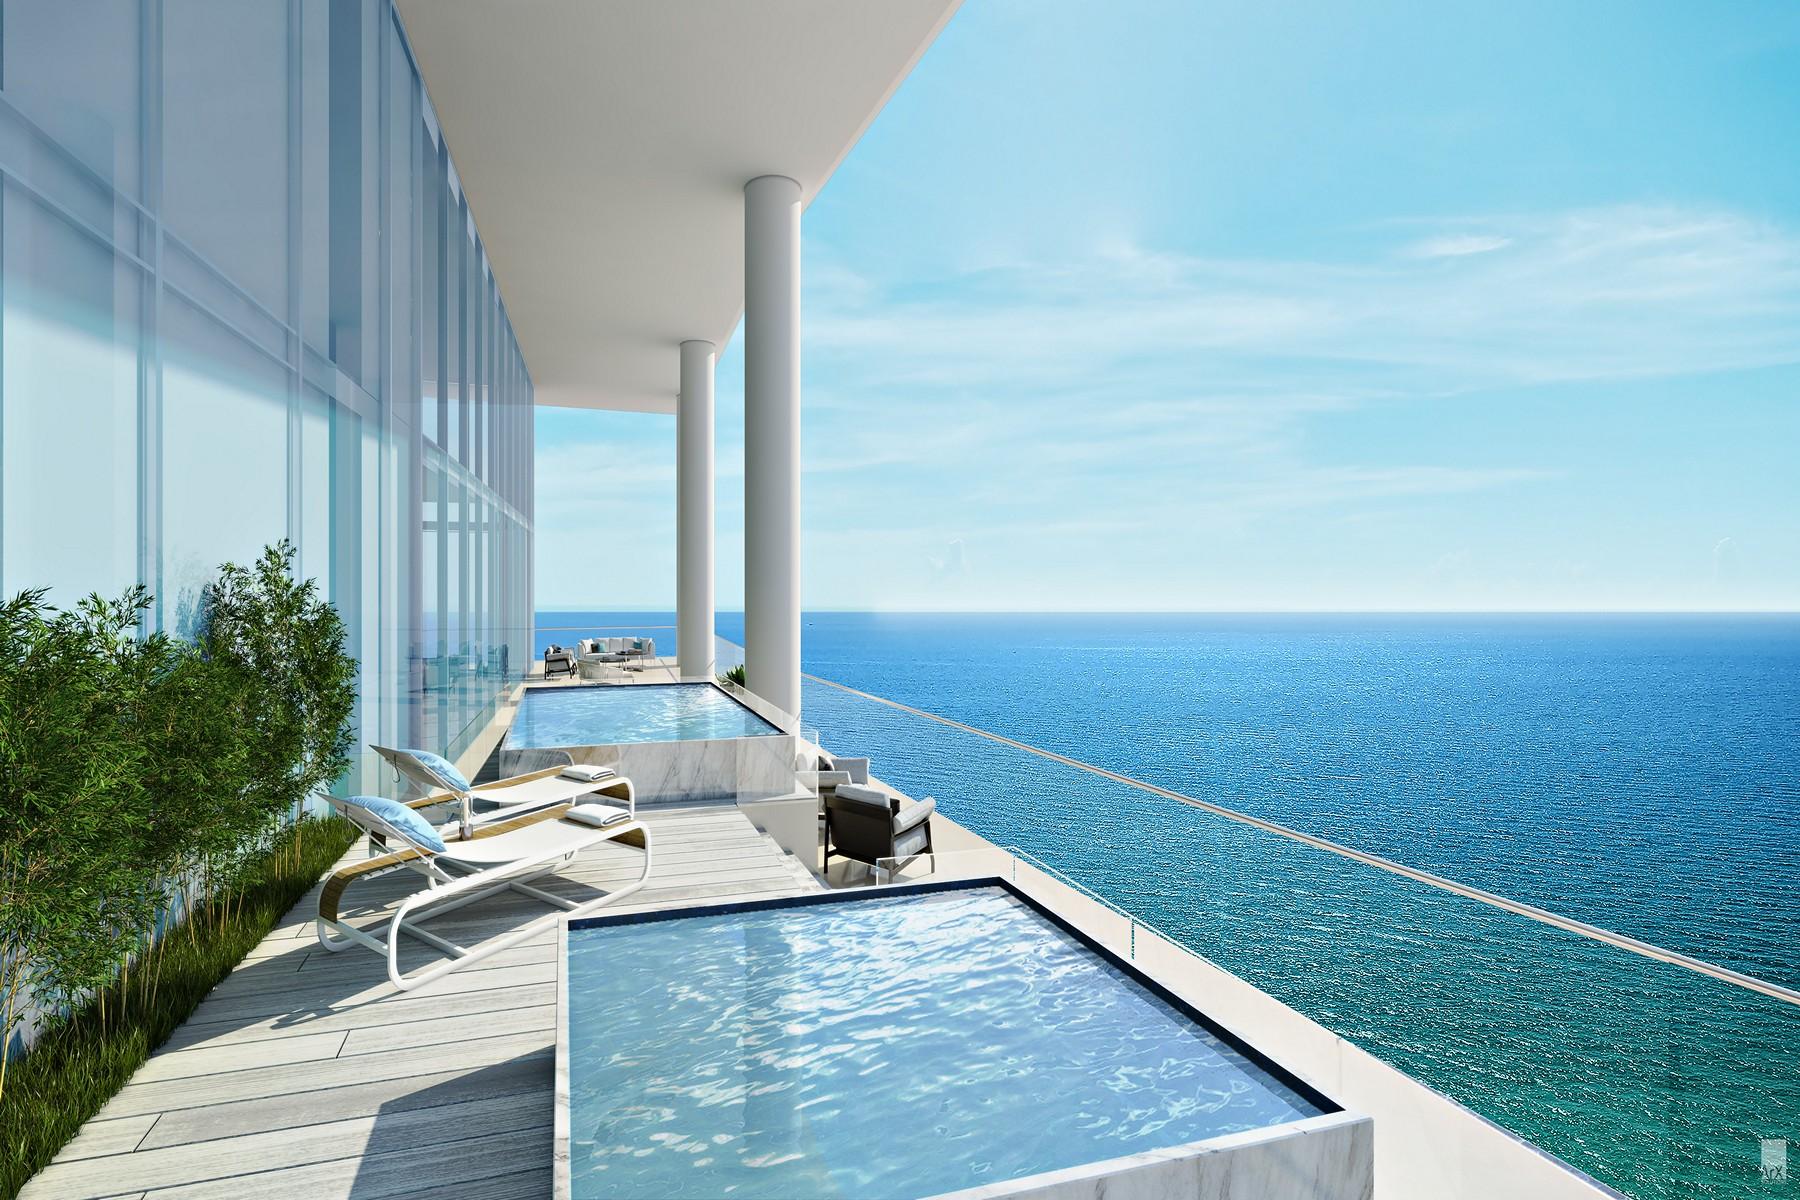 Condominium for Sale at Turnberry Ocean Club 18501 Collins 1402 Sunny Isles Beach, Florida, 33160 United States